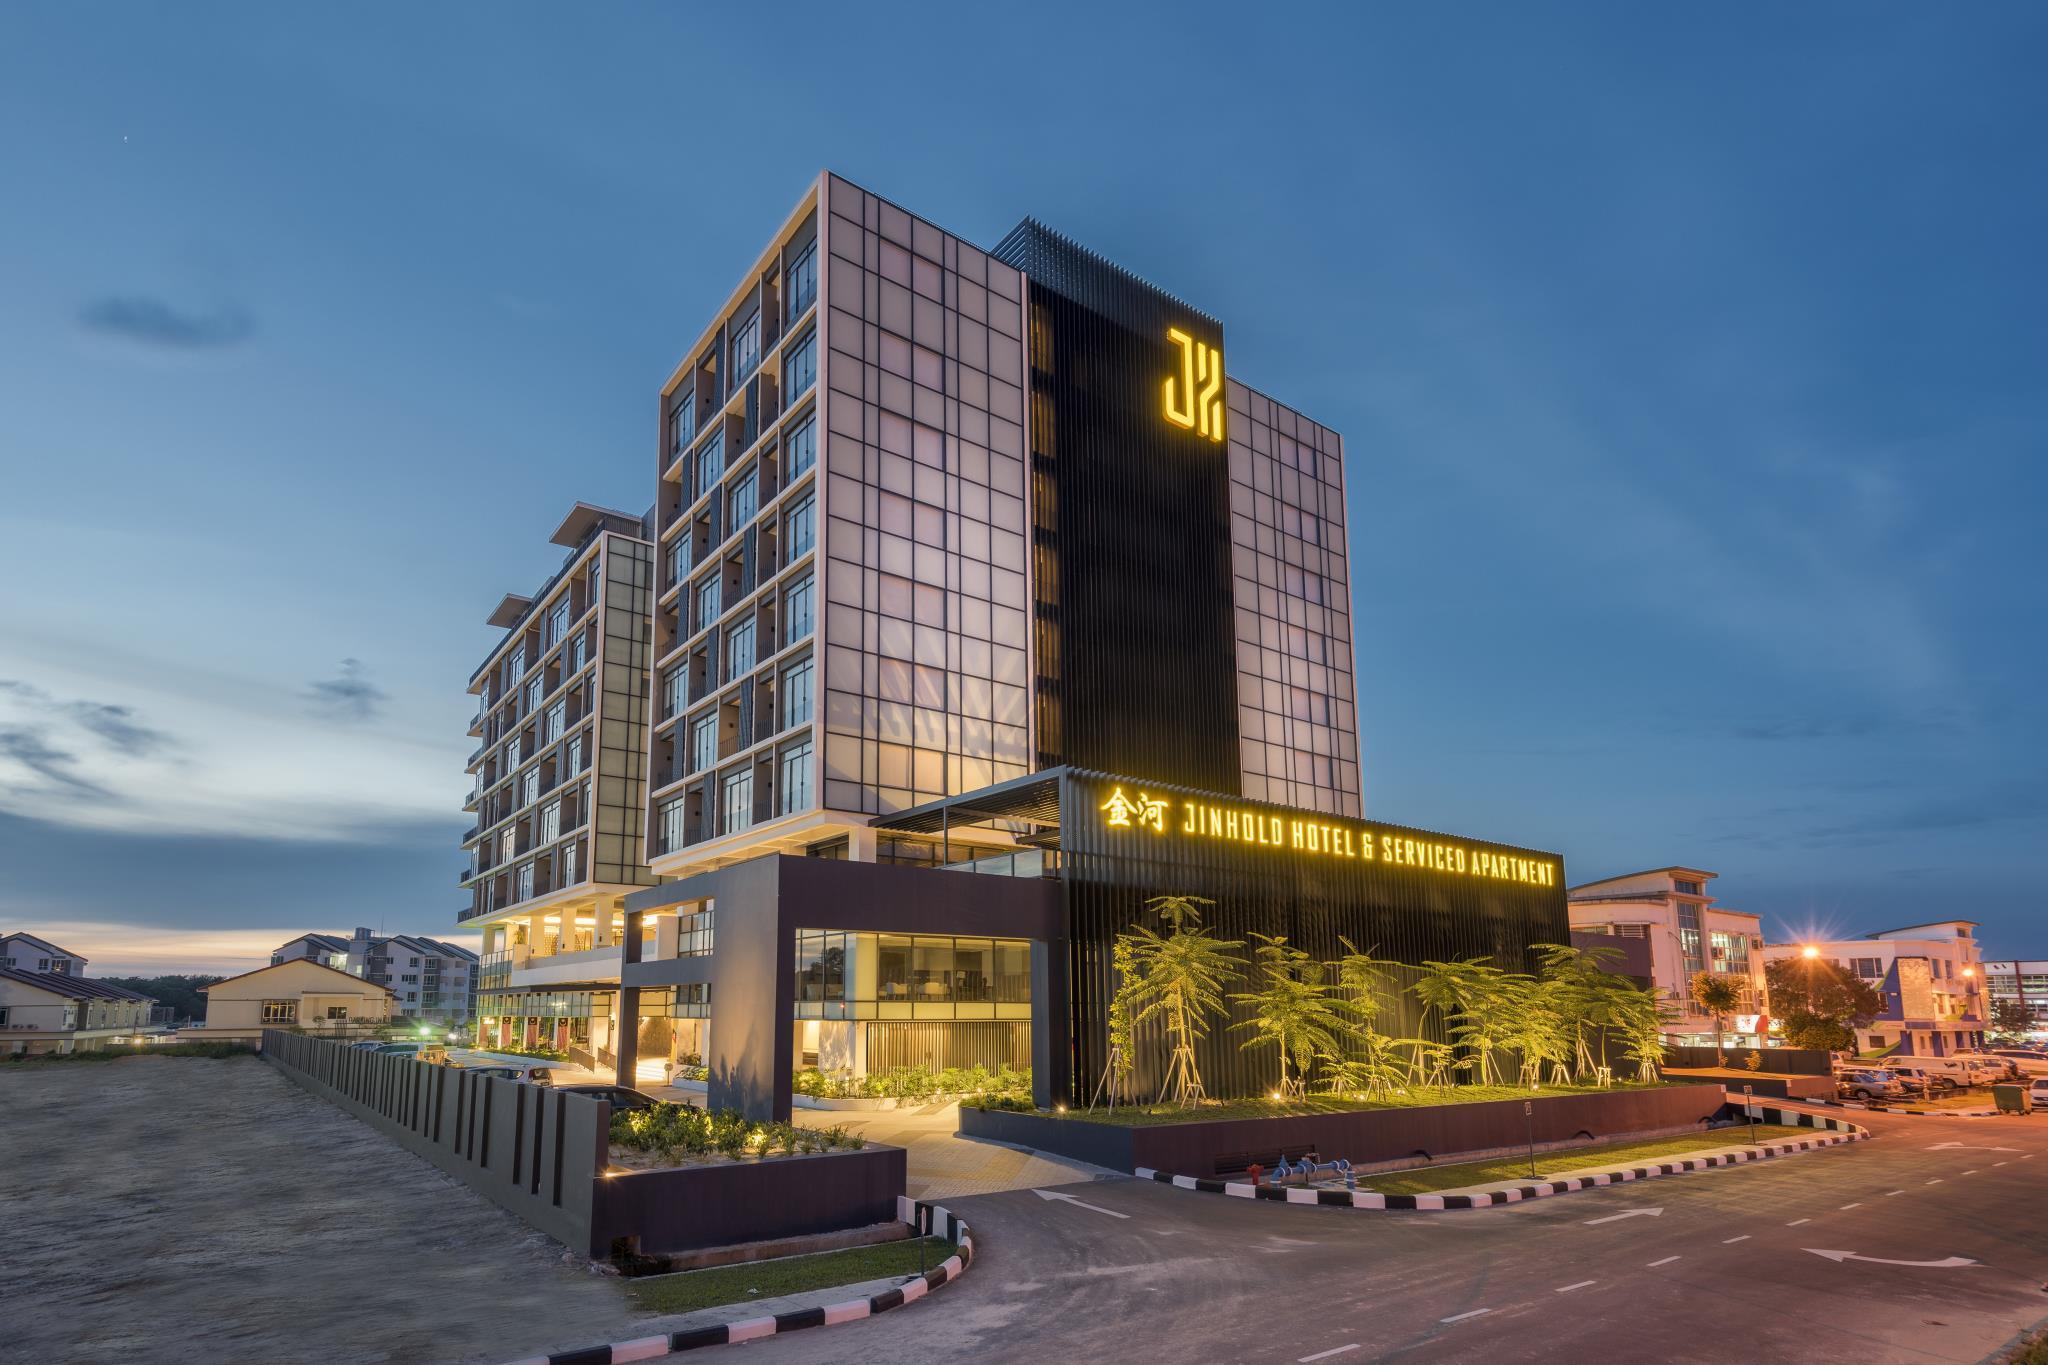 Jinhold Hotel & Serviced Apartment, Miri